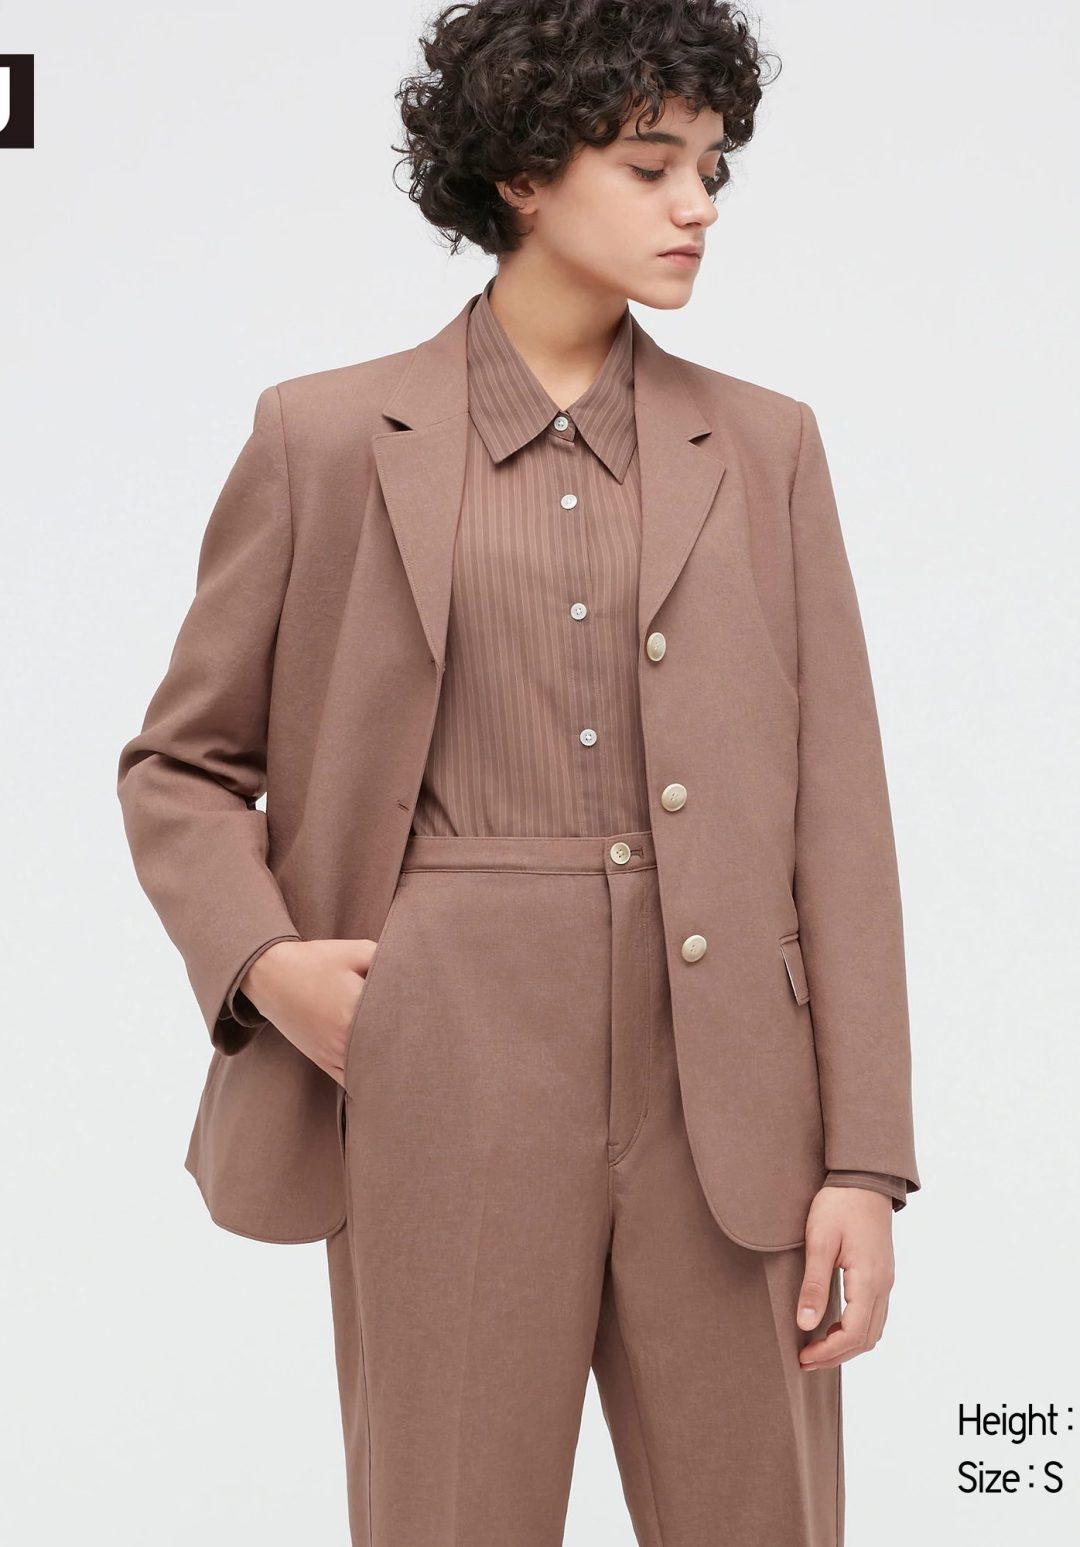 Brown tailored blazer suit